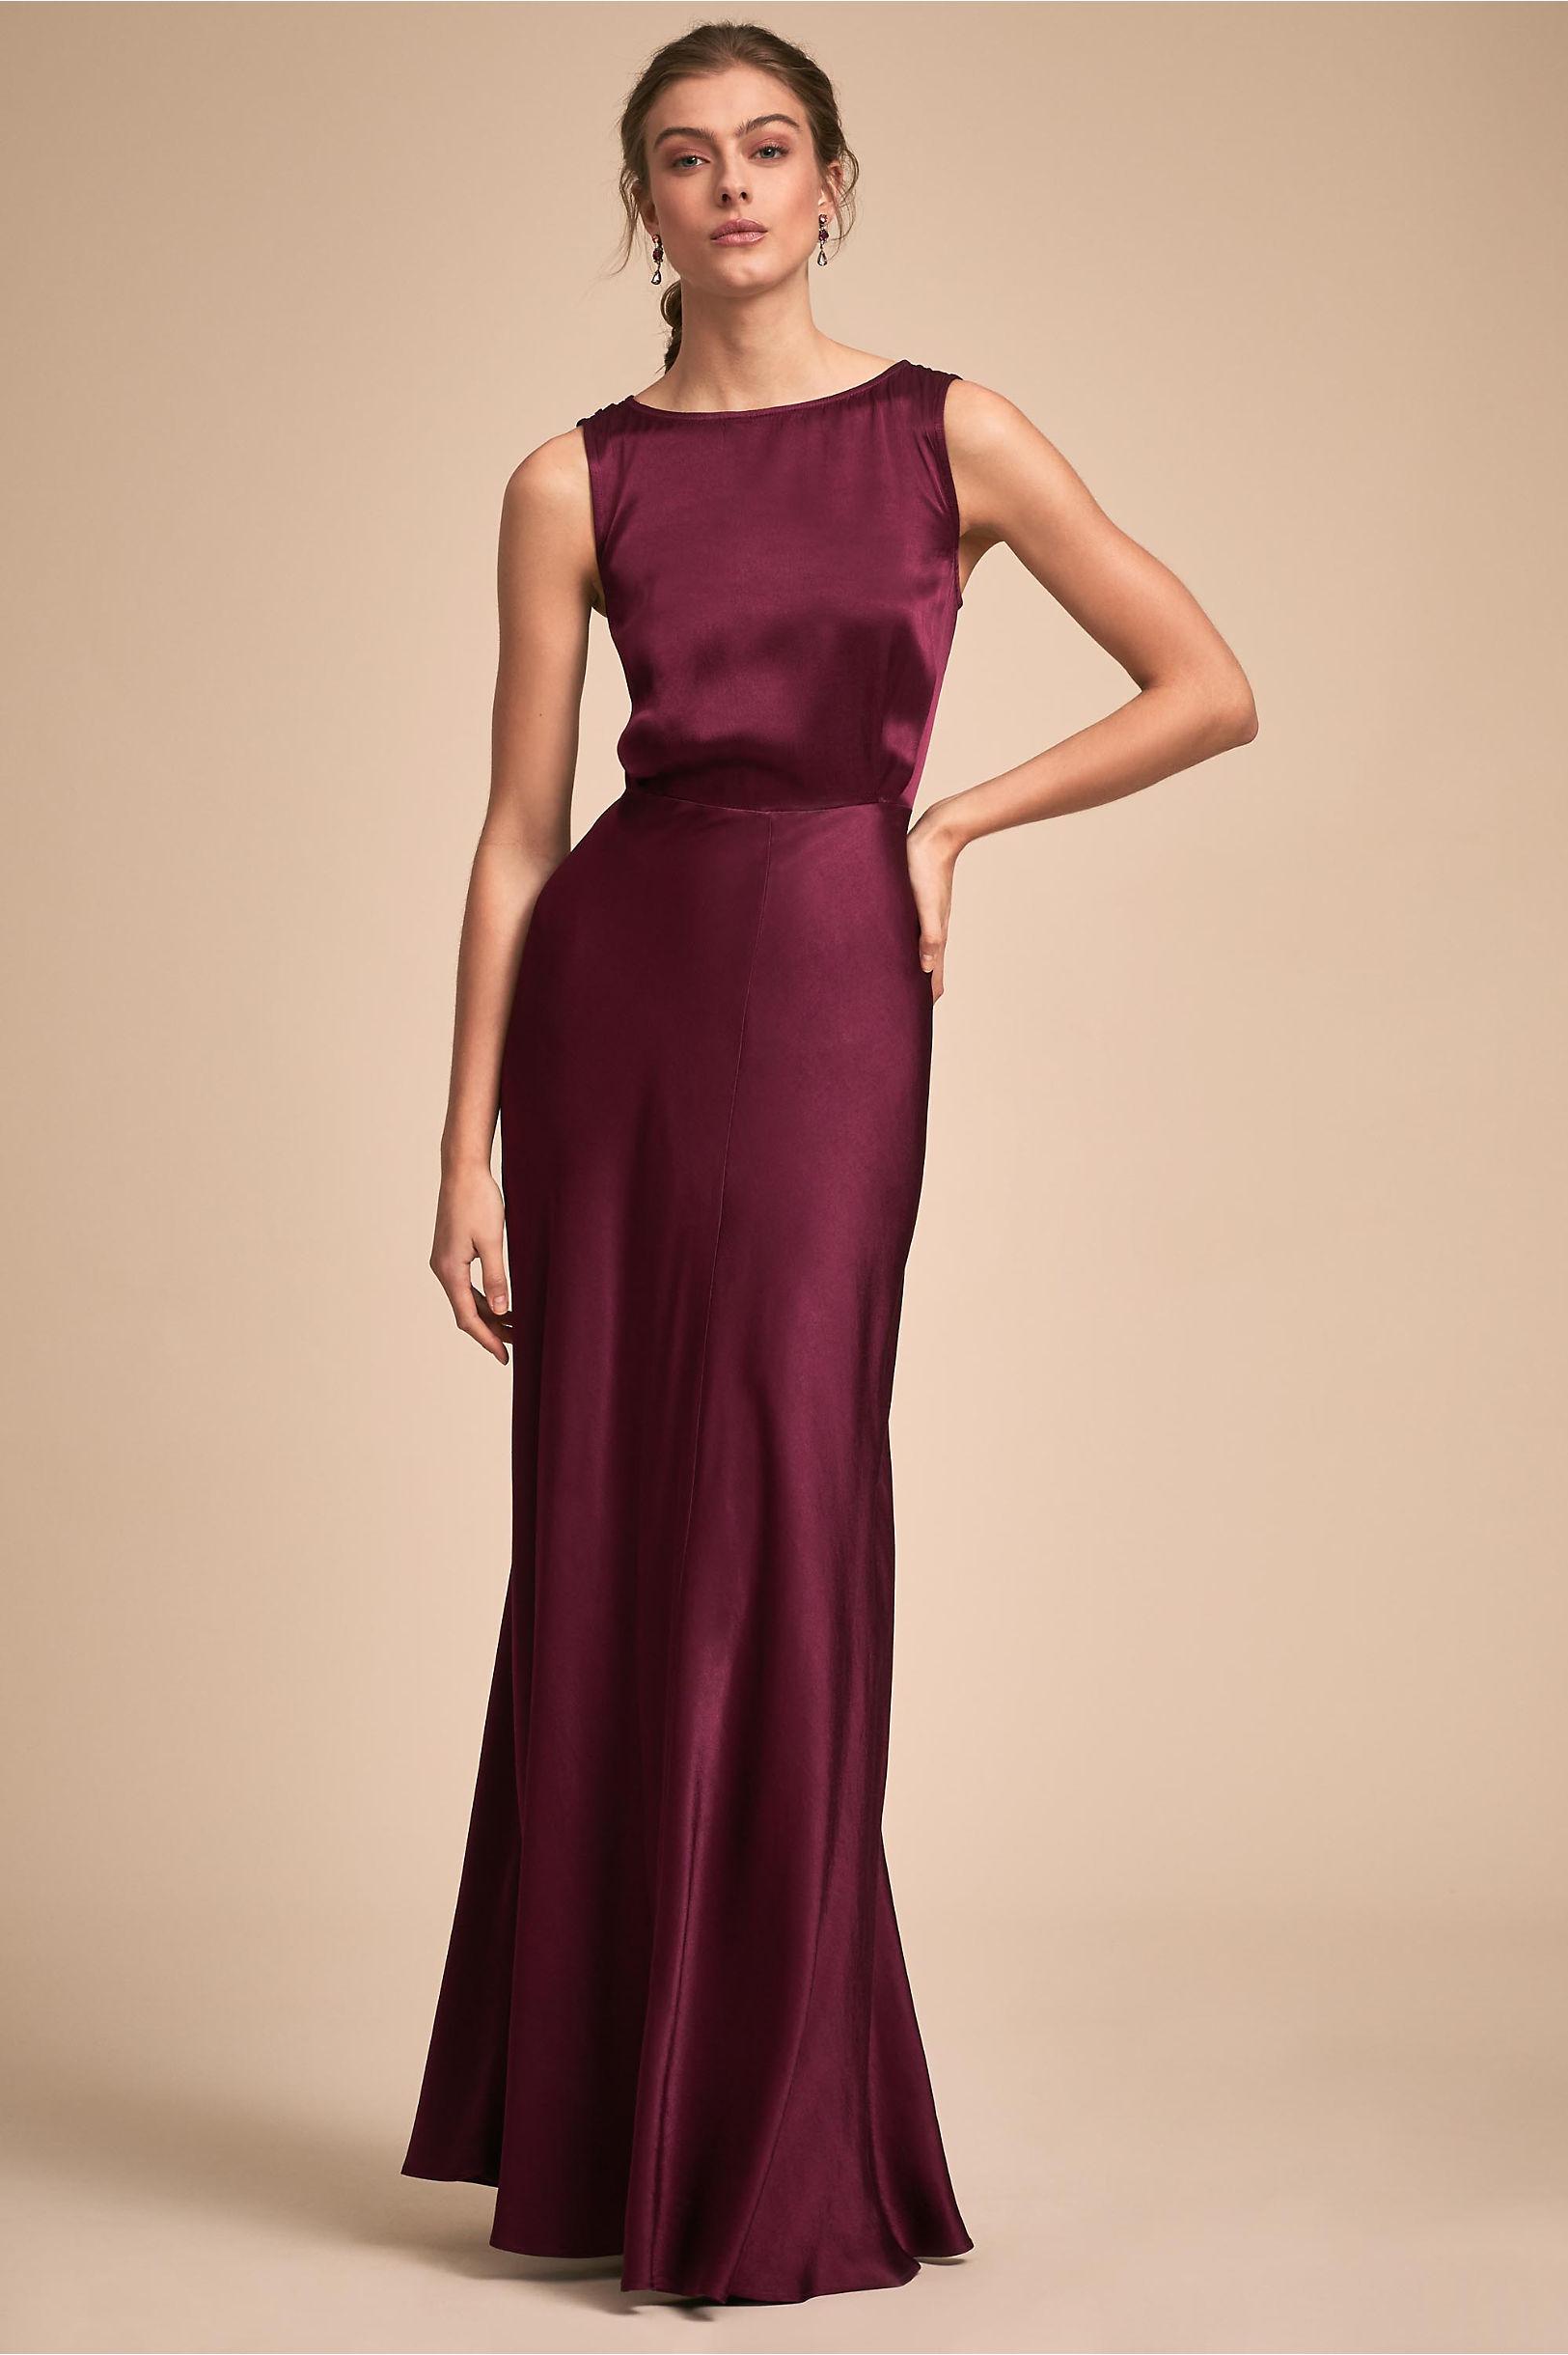 80d4fab282 BHLDN s Ghost London Alexia Dress in Black Cherry